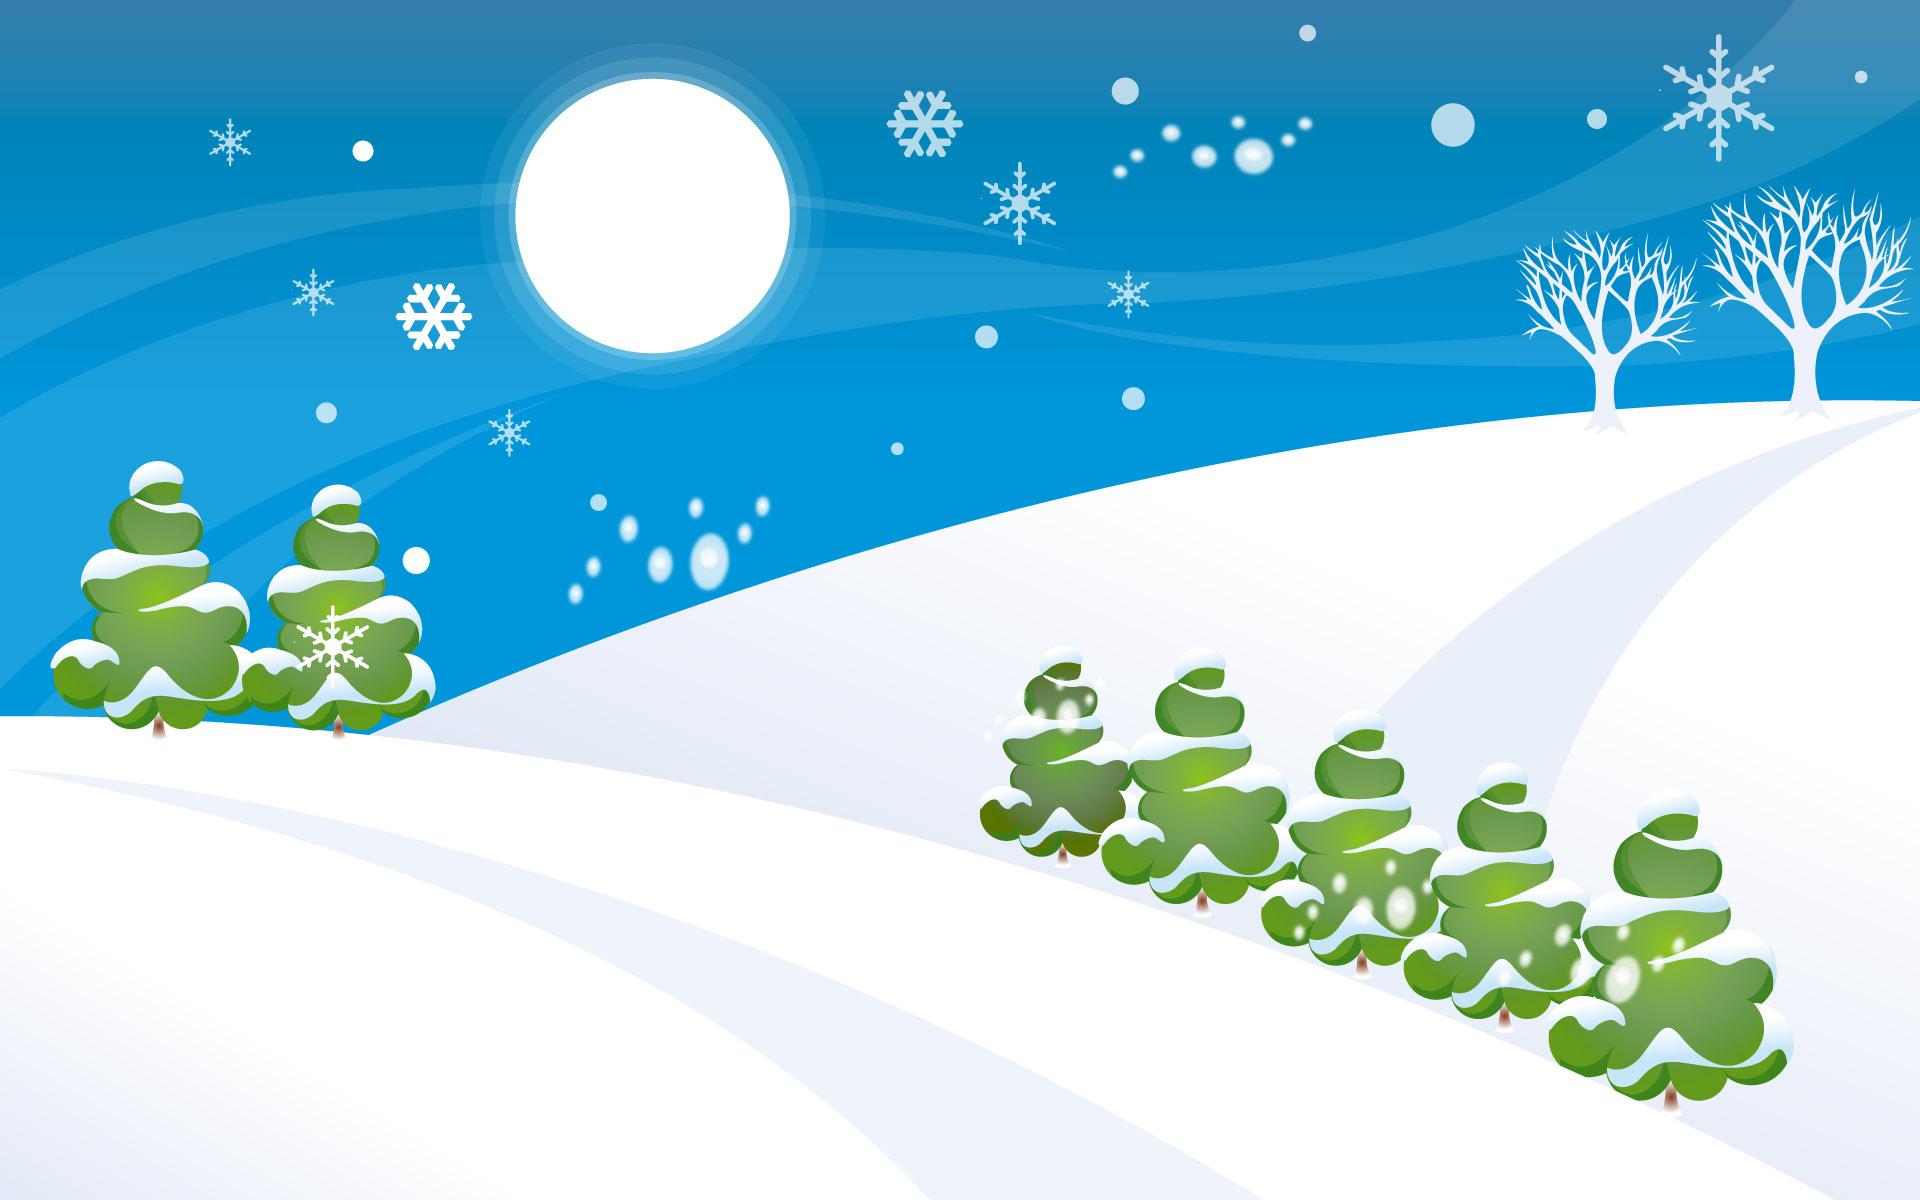 HD Wallpapers Simple Christmas Snow World